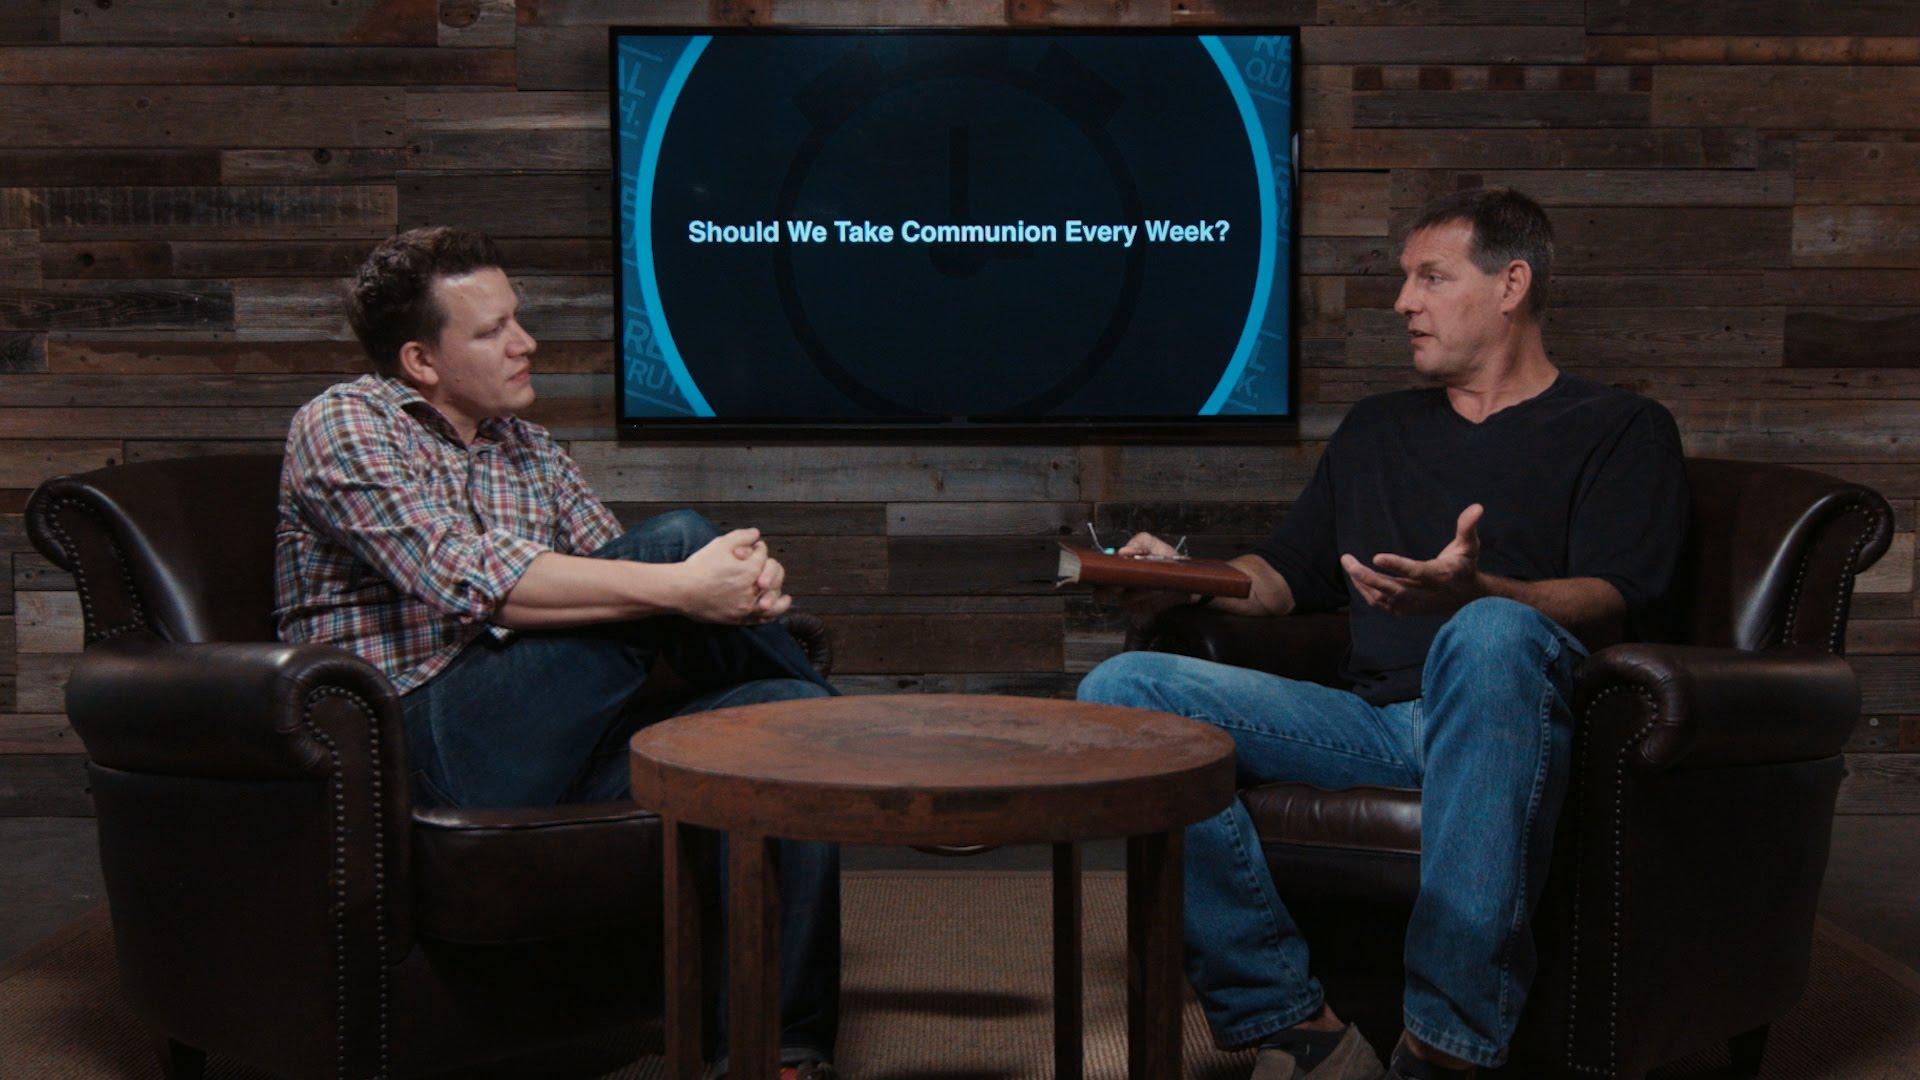 Should We Take Communion Every Week?